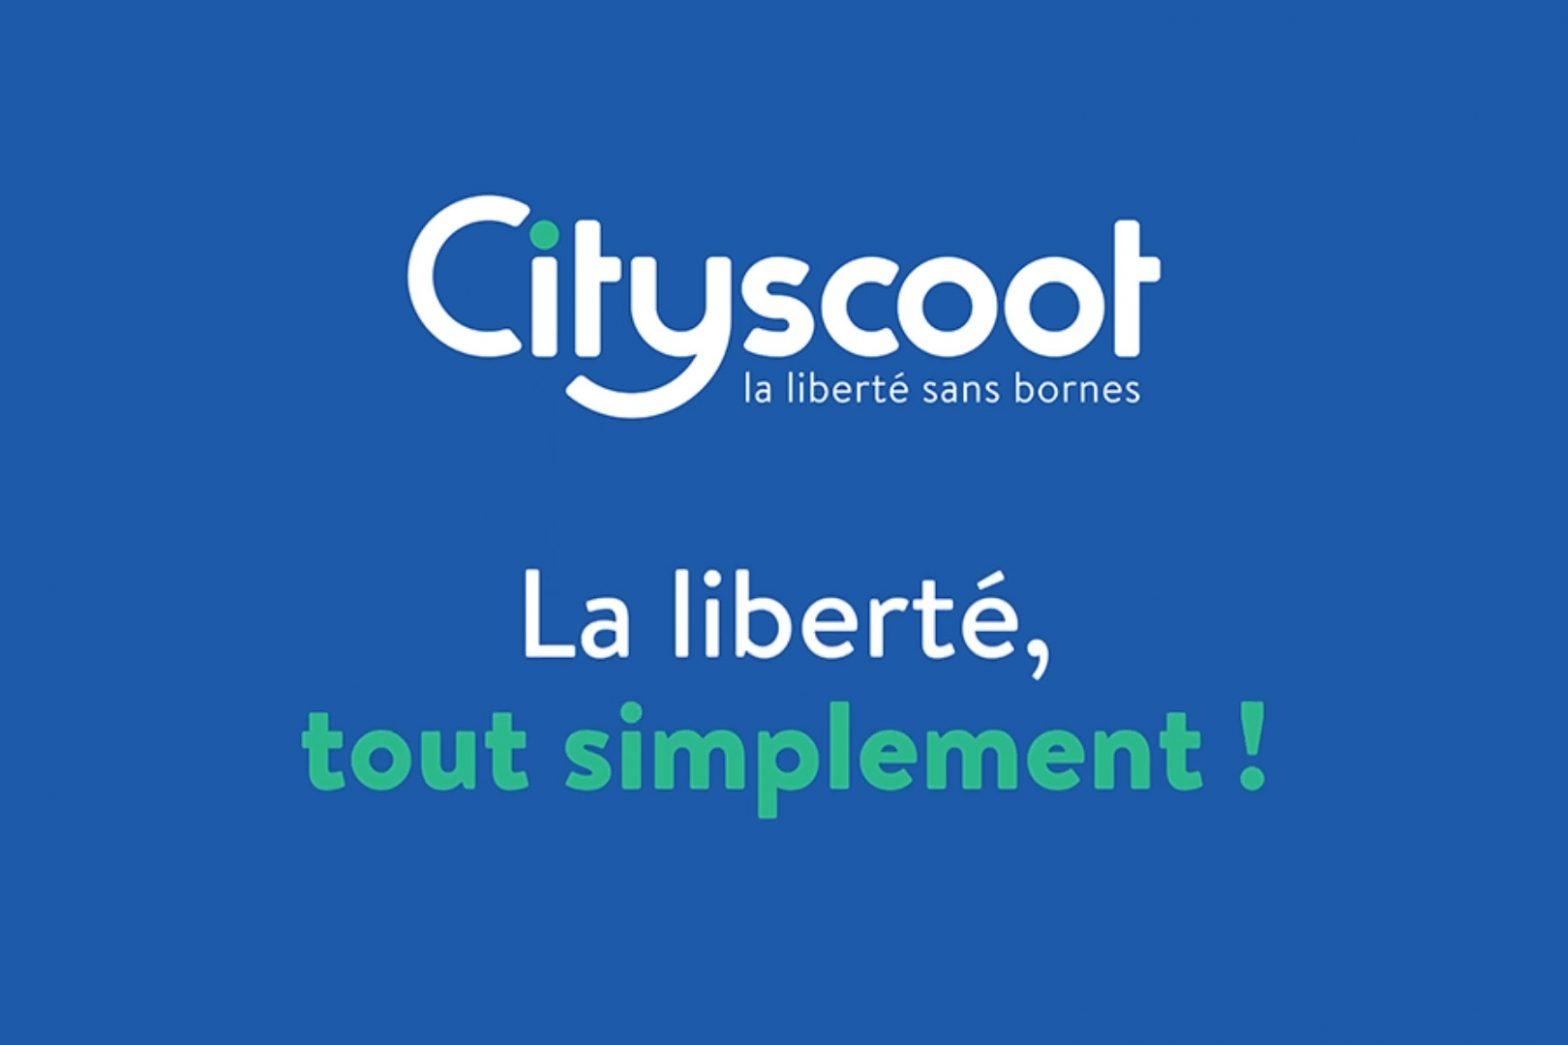 Cityscoot ad